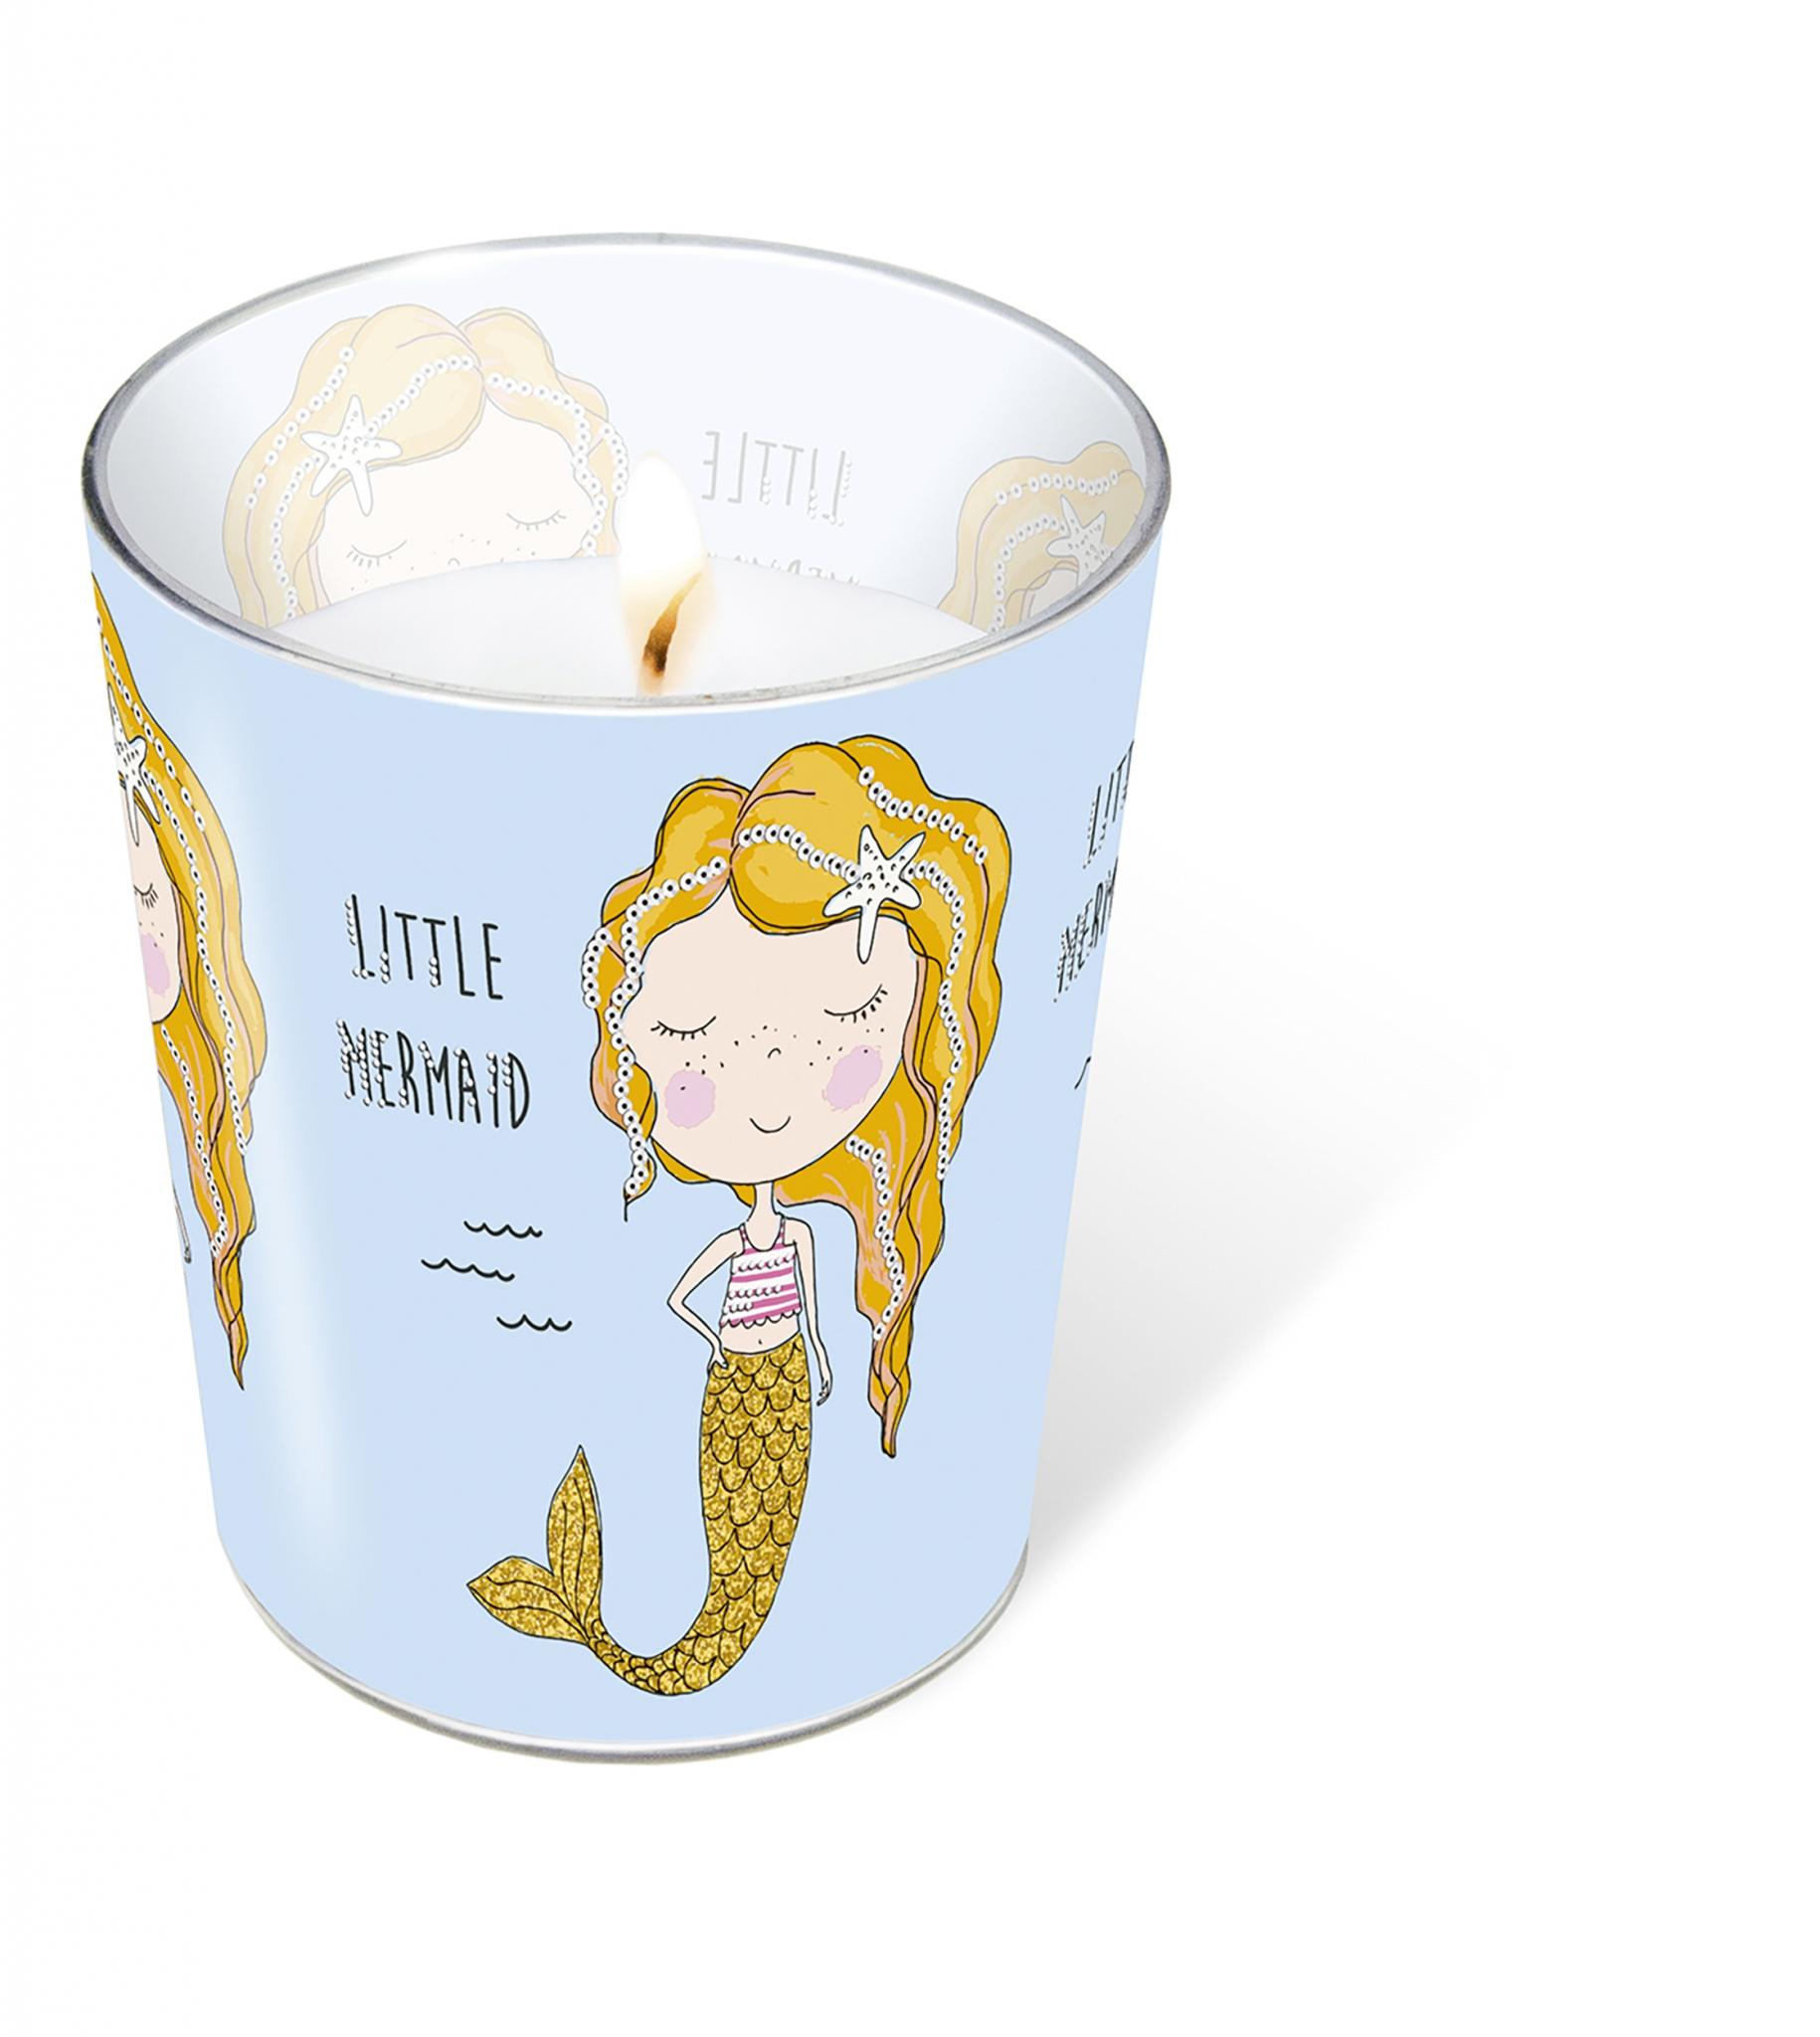 świeca szklana - Glaskerze Little mermaid